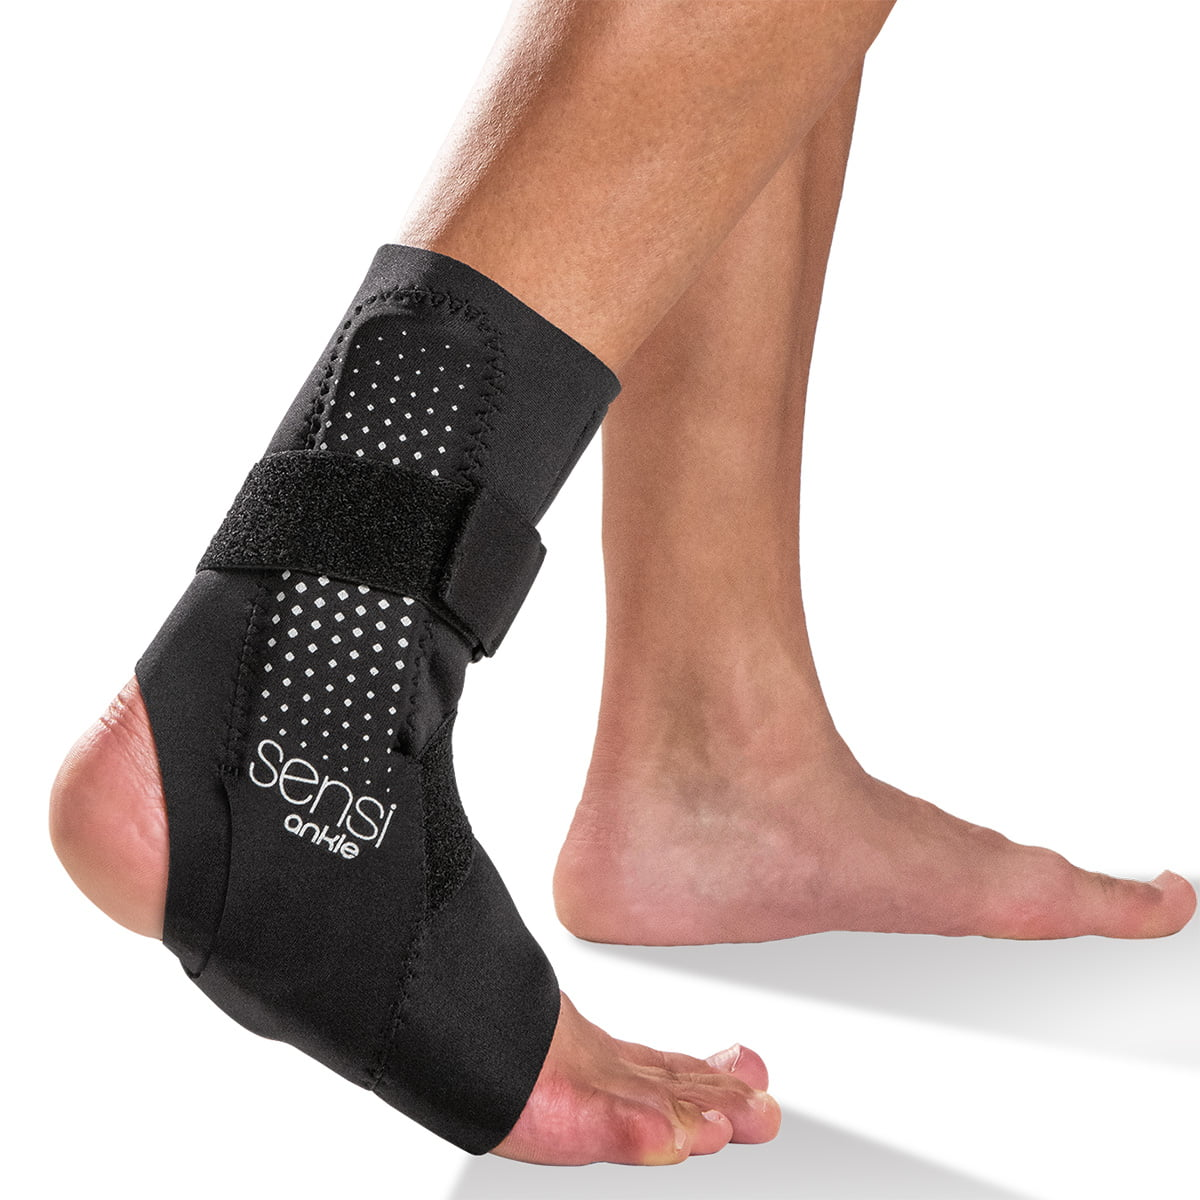 Sensi Ankle - Estabilizador de Tornozelo